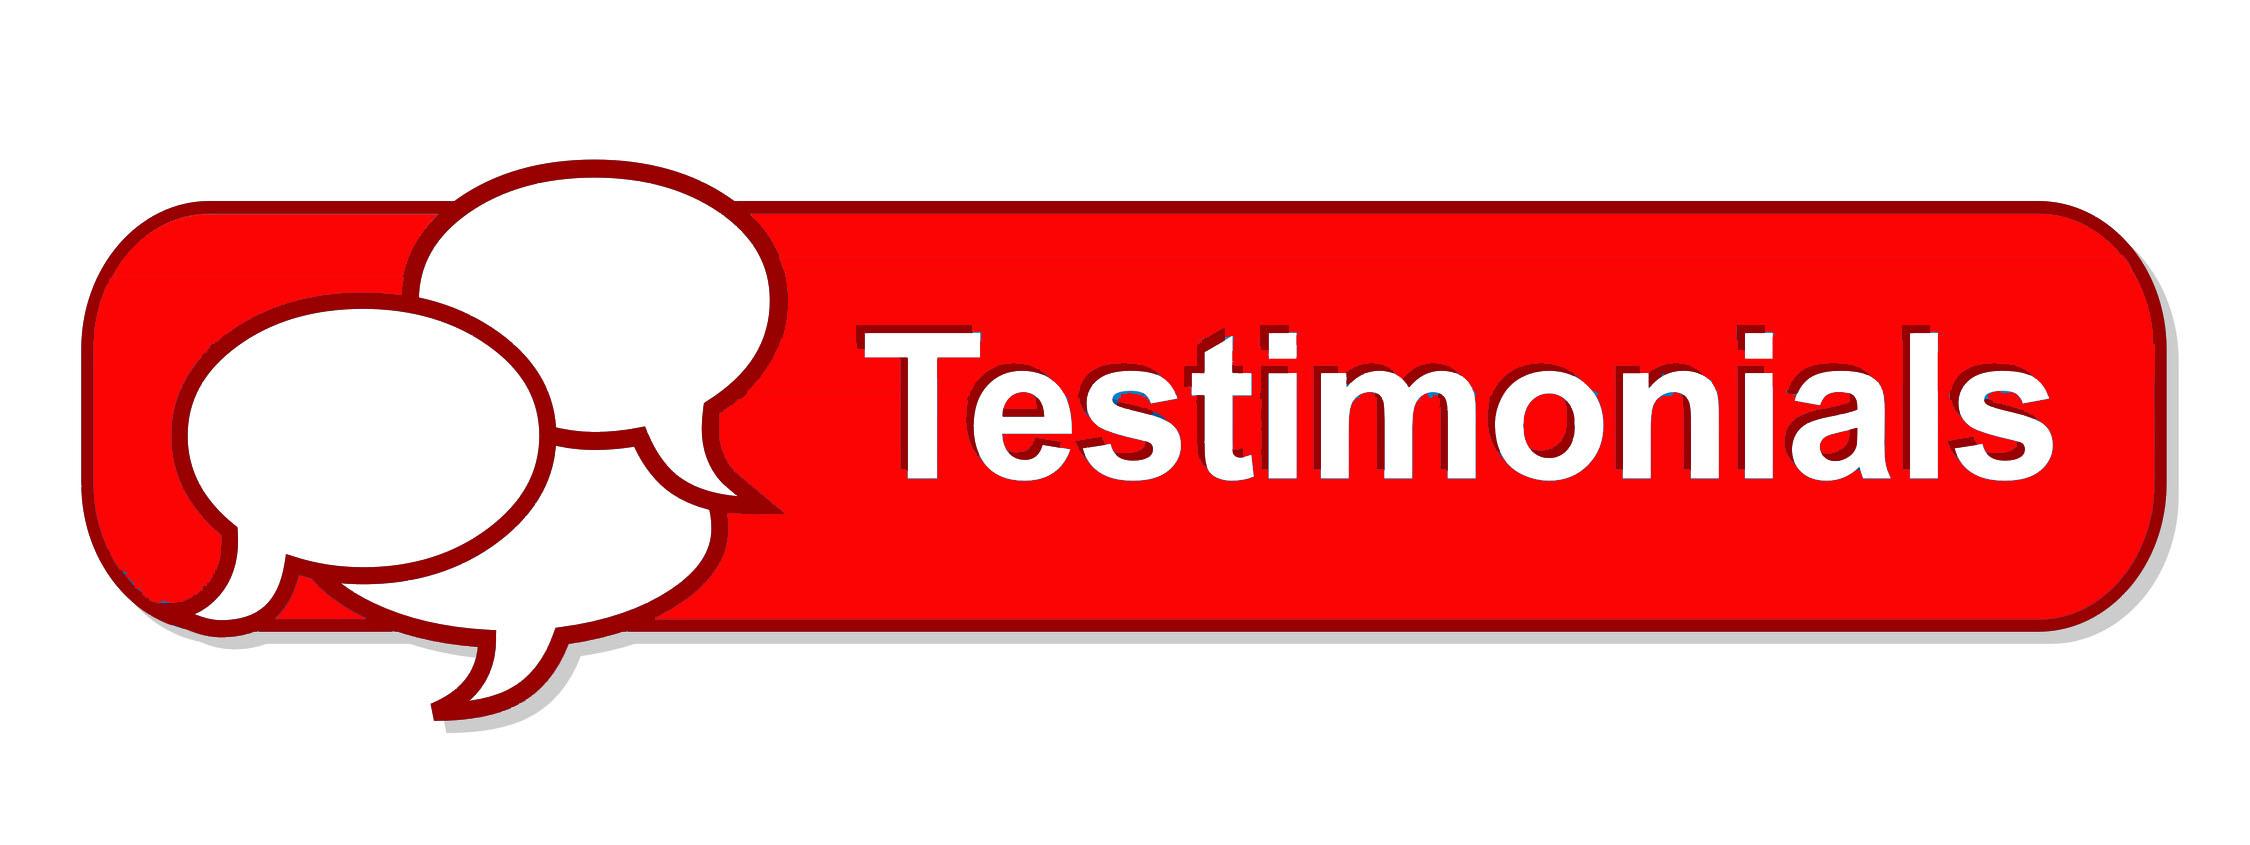 customer-testimonials1.jpg